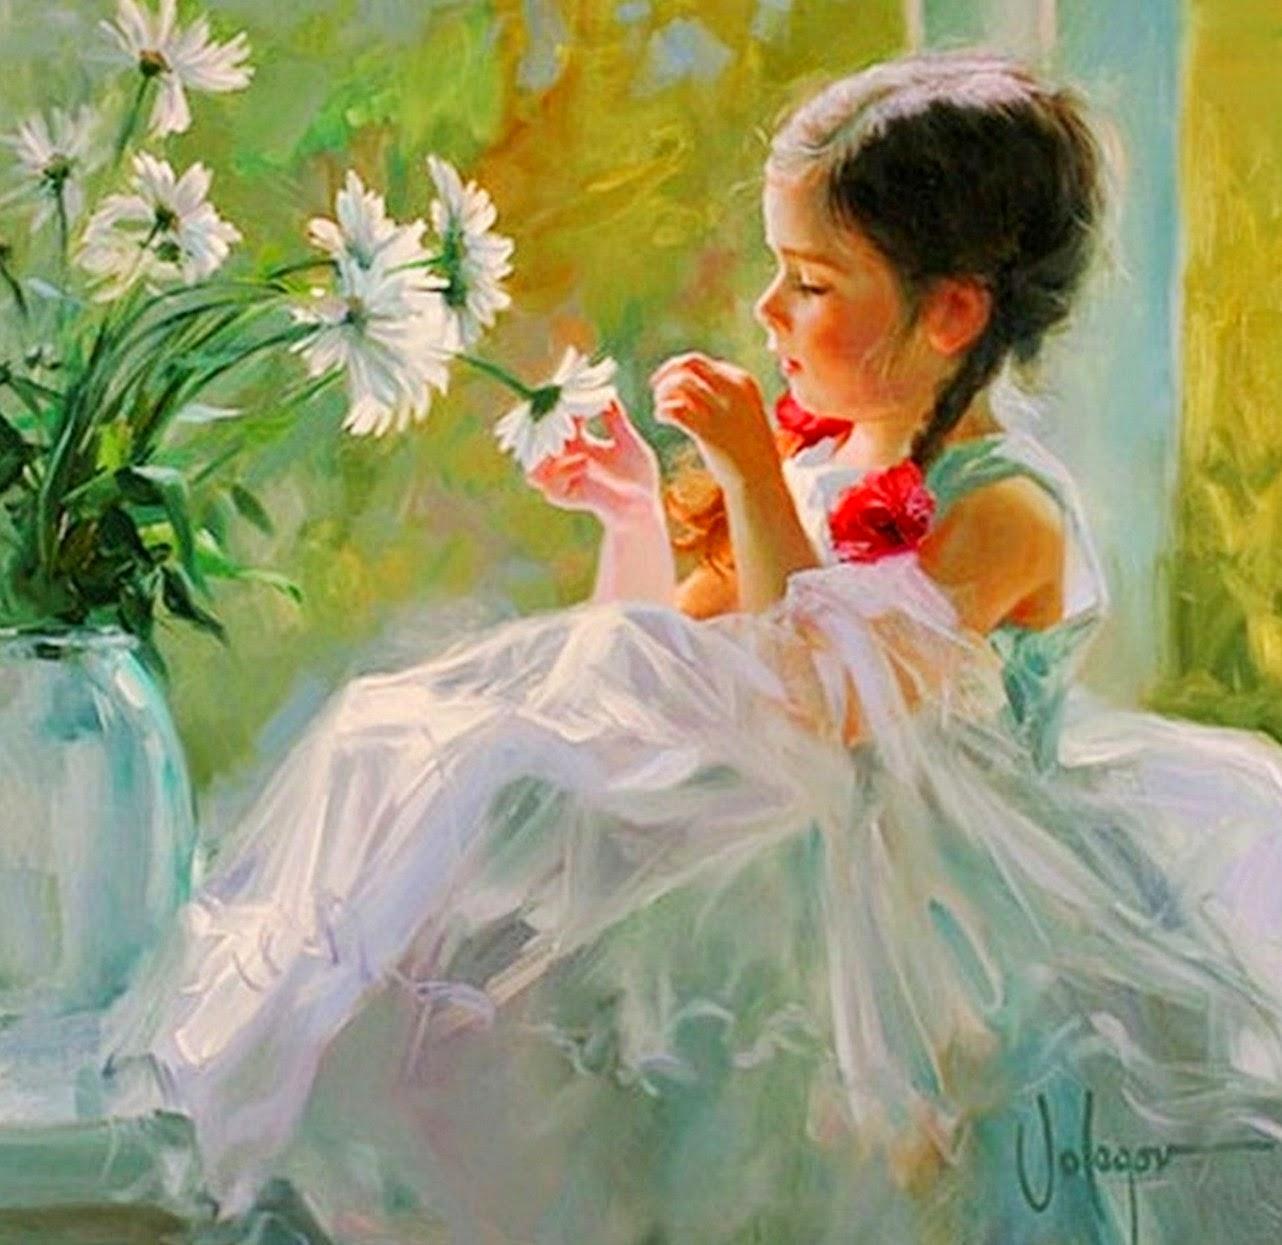 retrato-infantil-con-flores-blancas